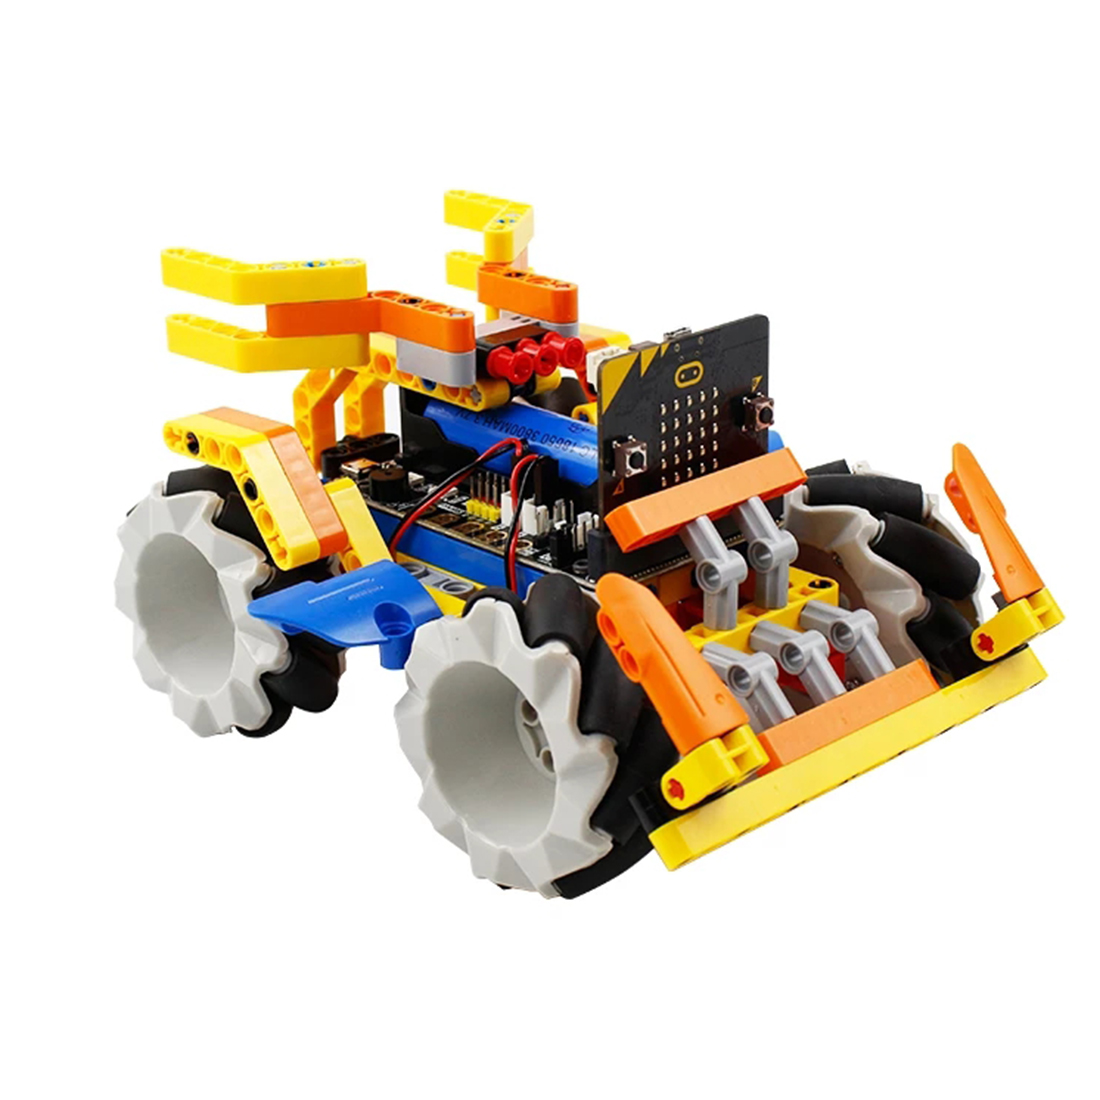 New Program Intelligent Robot Building Block Kit Mecanum Wheel Robot Car For Micro: Bit  Programmable Toys For Kids Adults Gift